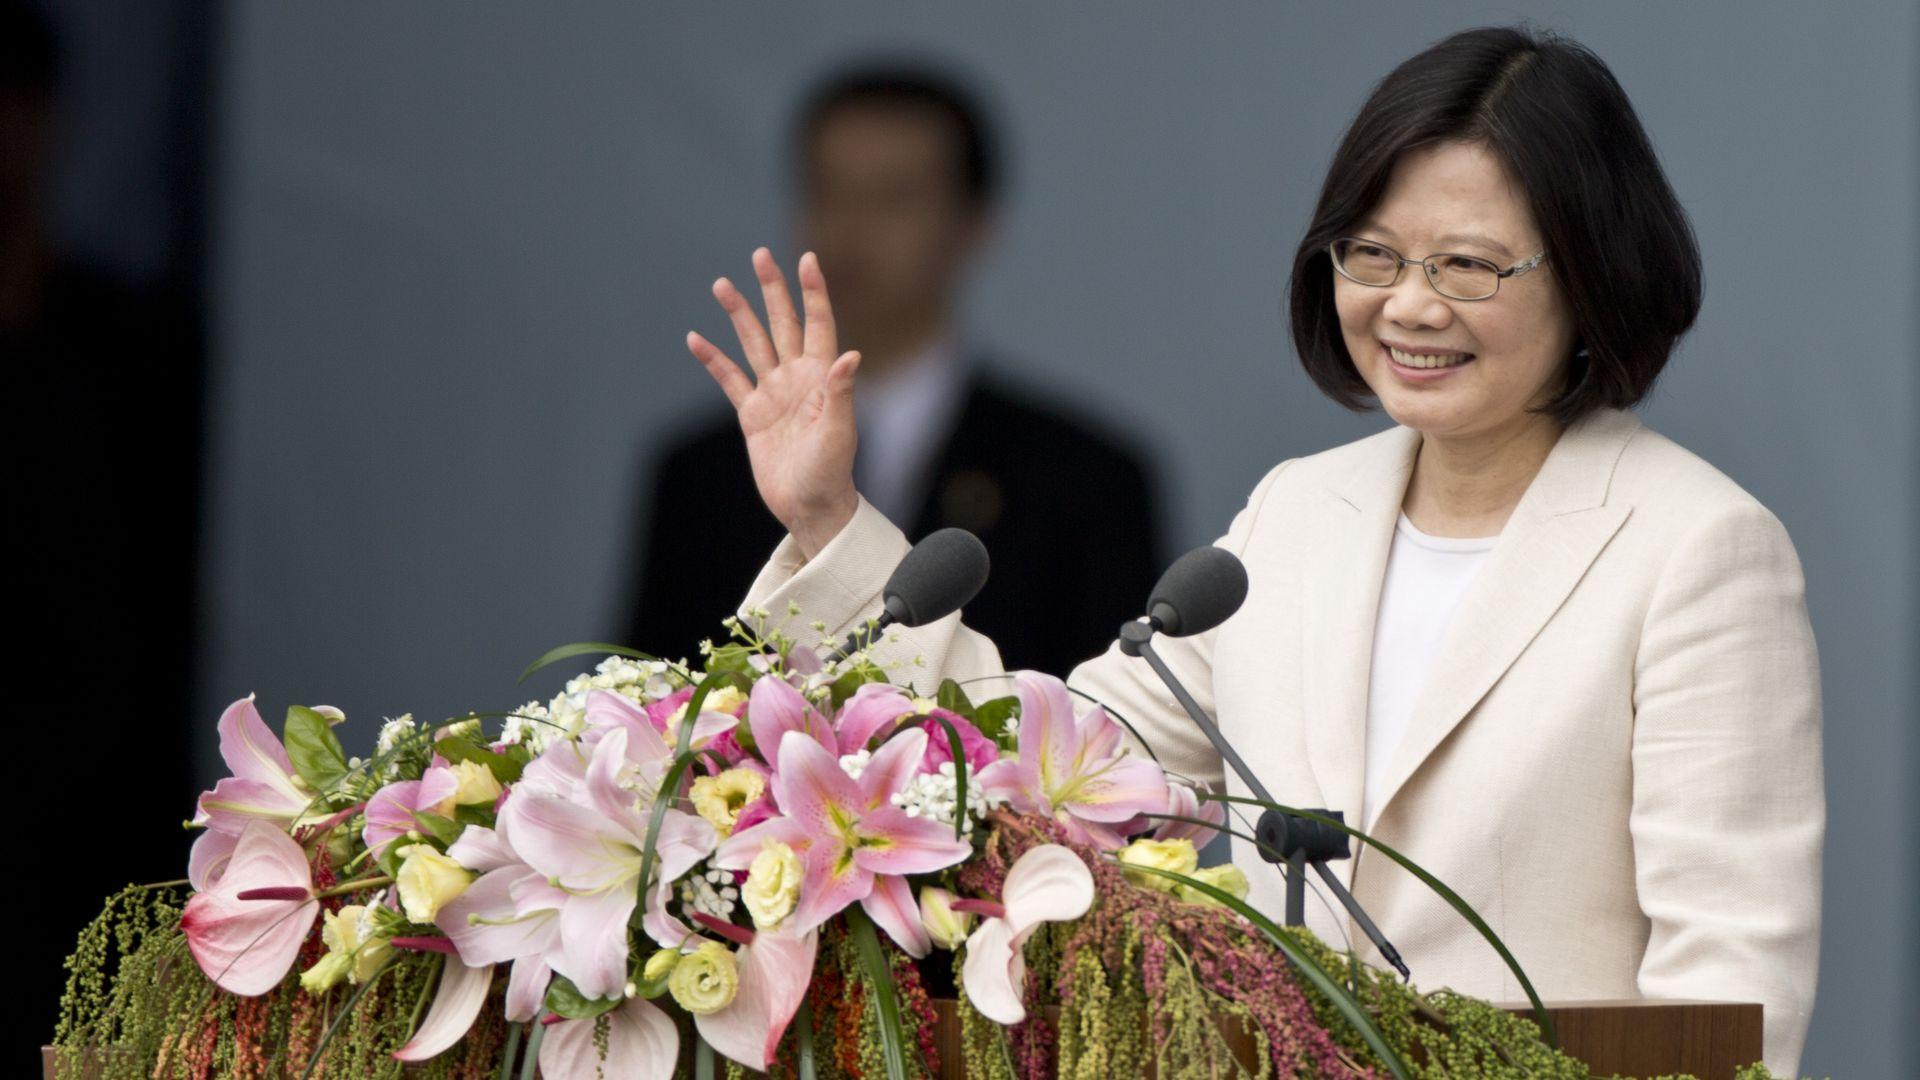 Taiwanese president Tsai Ing-wen waving from behind a lectern